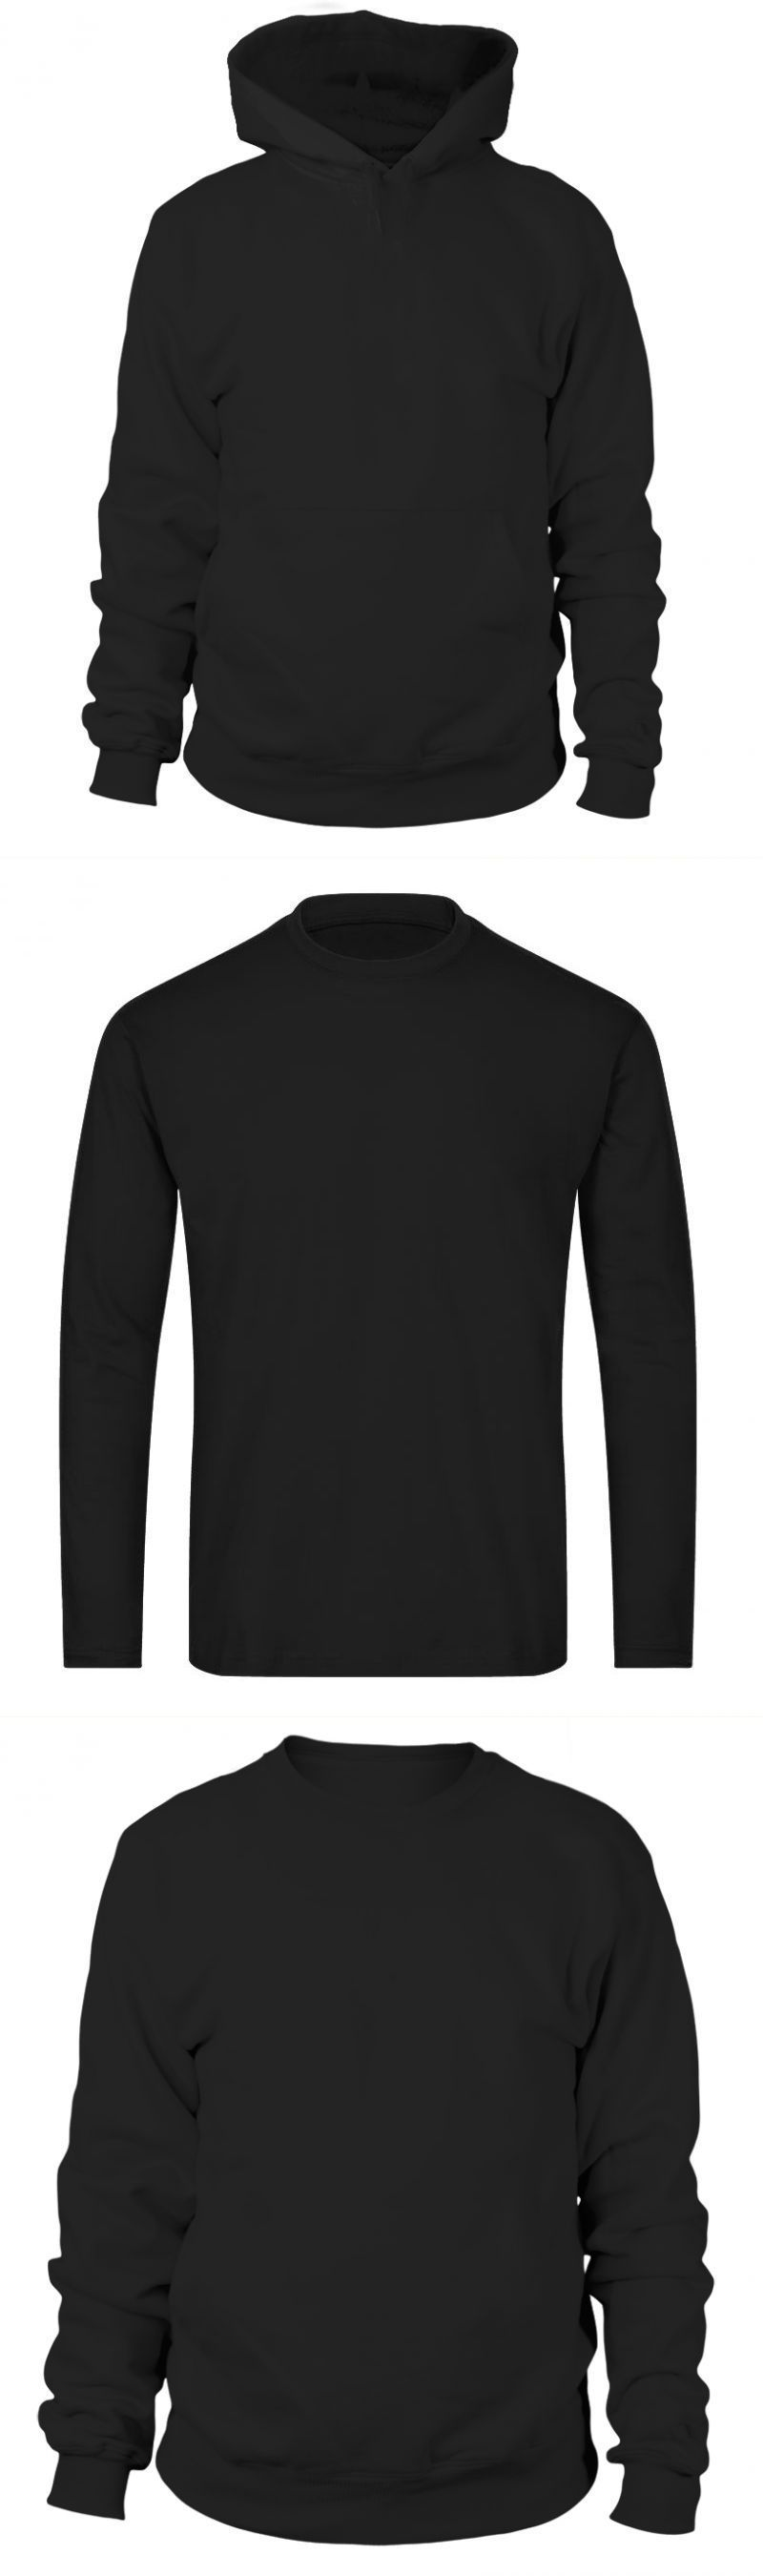 Transportation birthday shirt sei immer  nett  zu einem  lkw-fahrer knight transportation shirts #transportation #birthday #shirt #sei #immer #nett #zu #einem #lkw-fahrer #knight #shirts #dow #jones #short #etf #hoodie #unisex #long #sleeved #t-shirt #sweatshirt